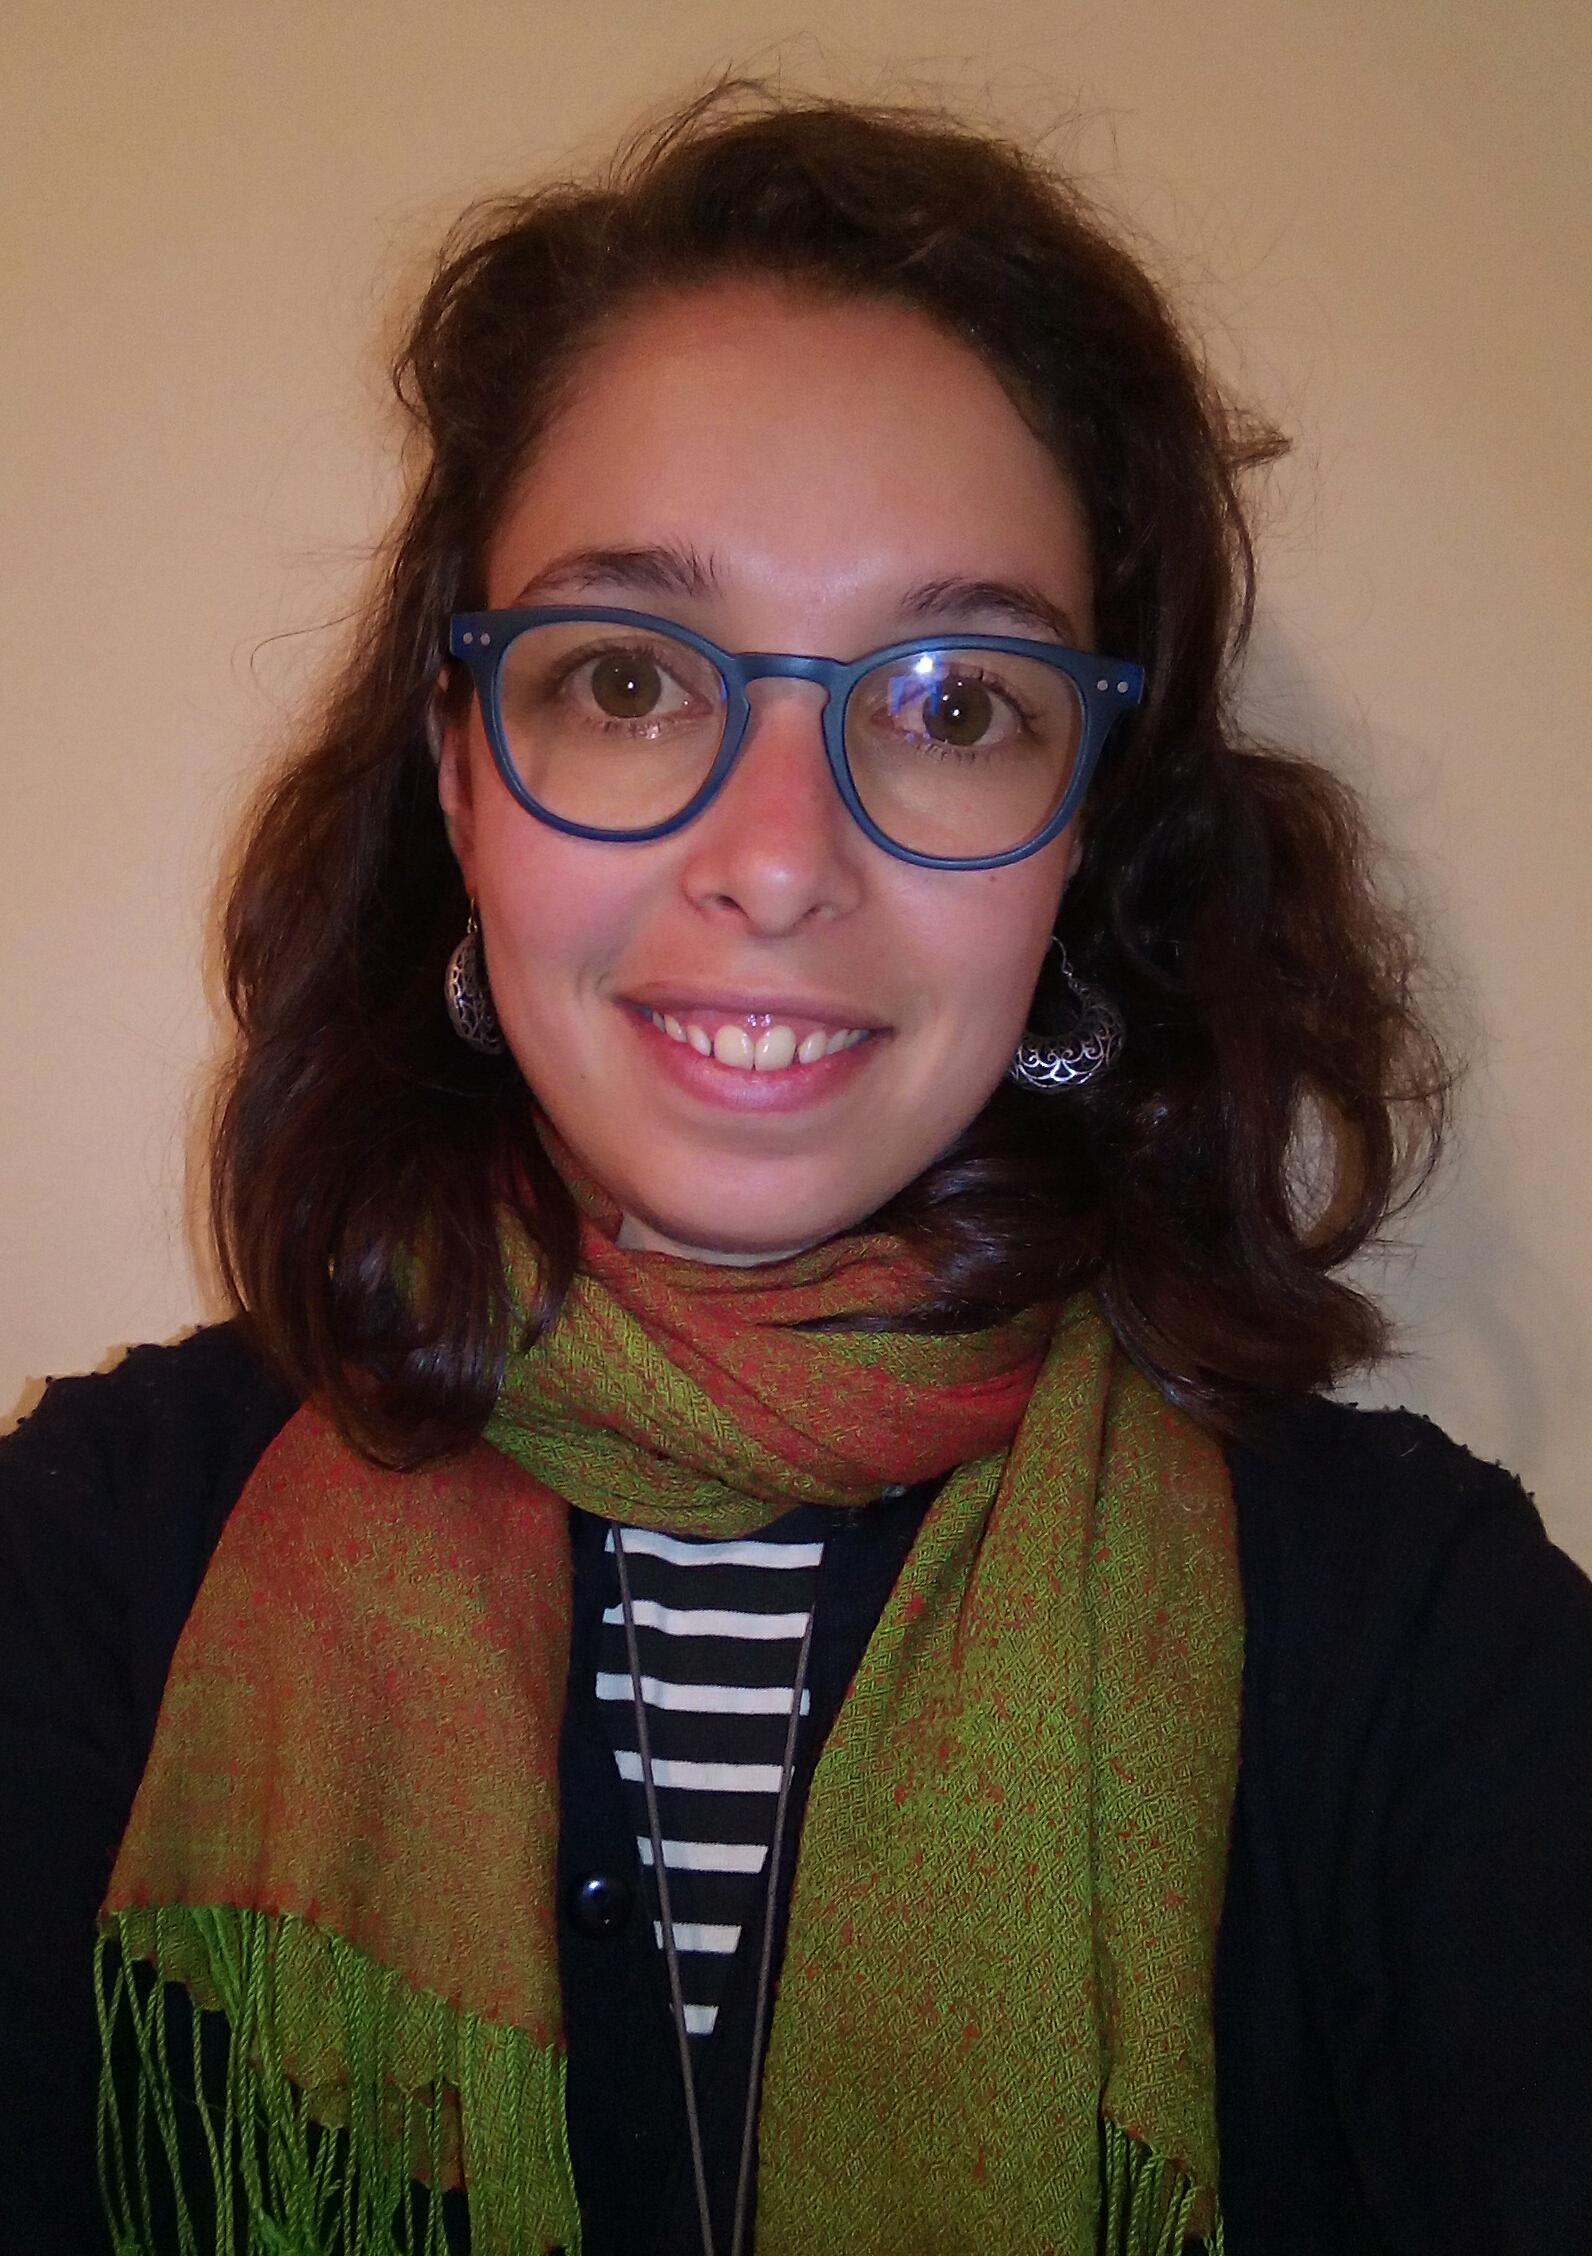 Ms Alba Rosa Boer Cueva